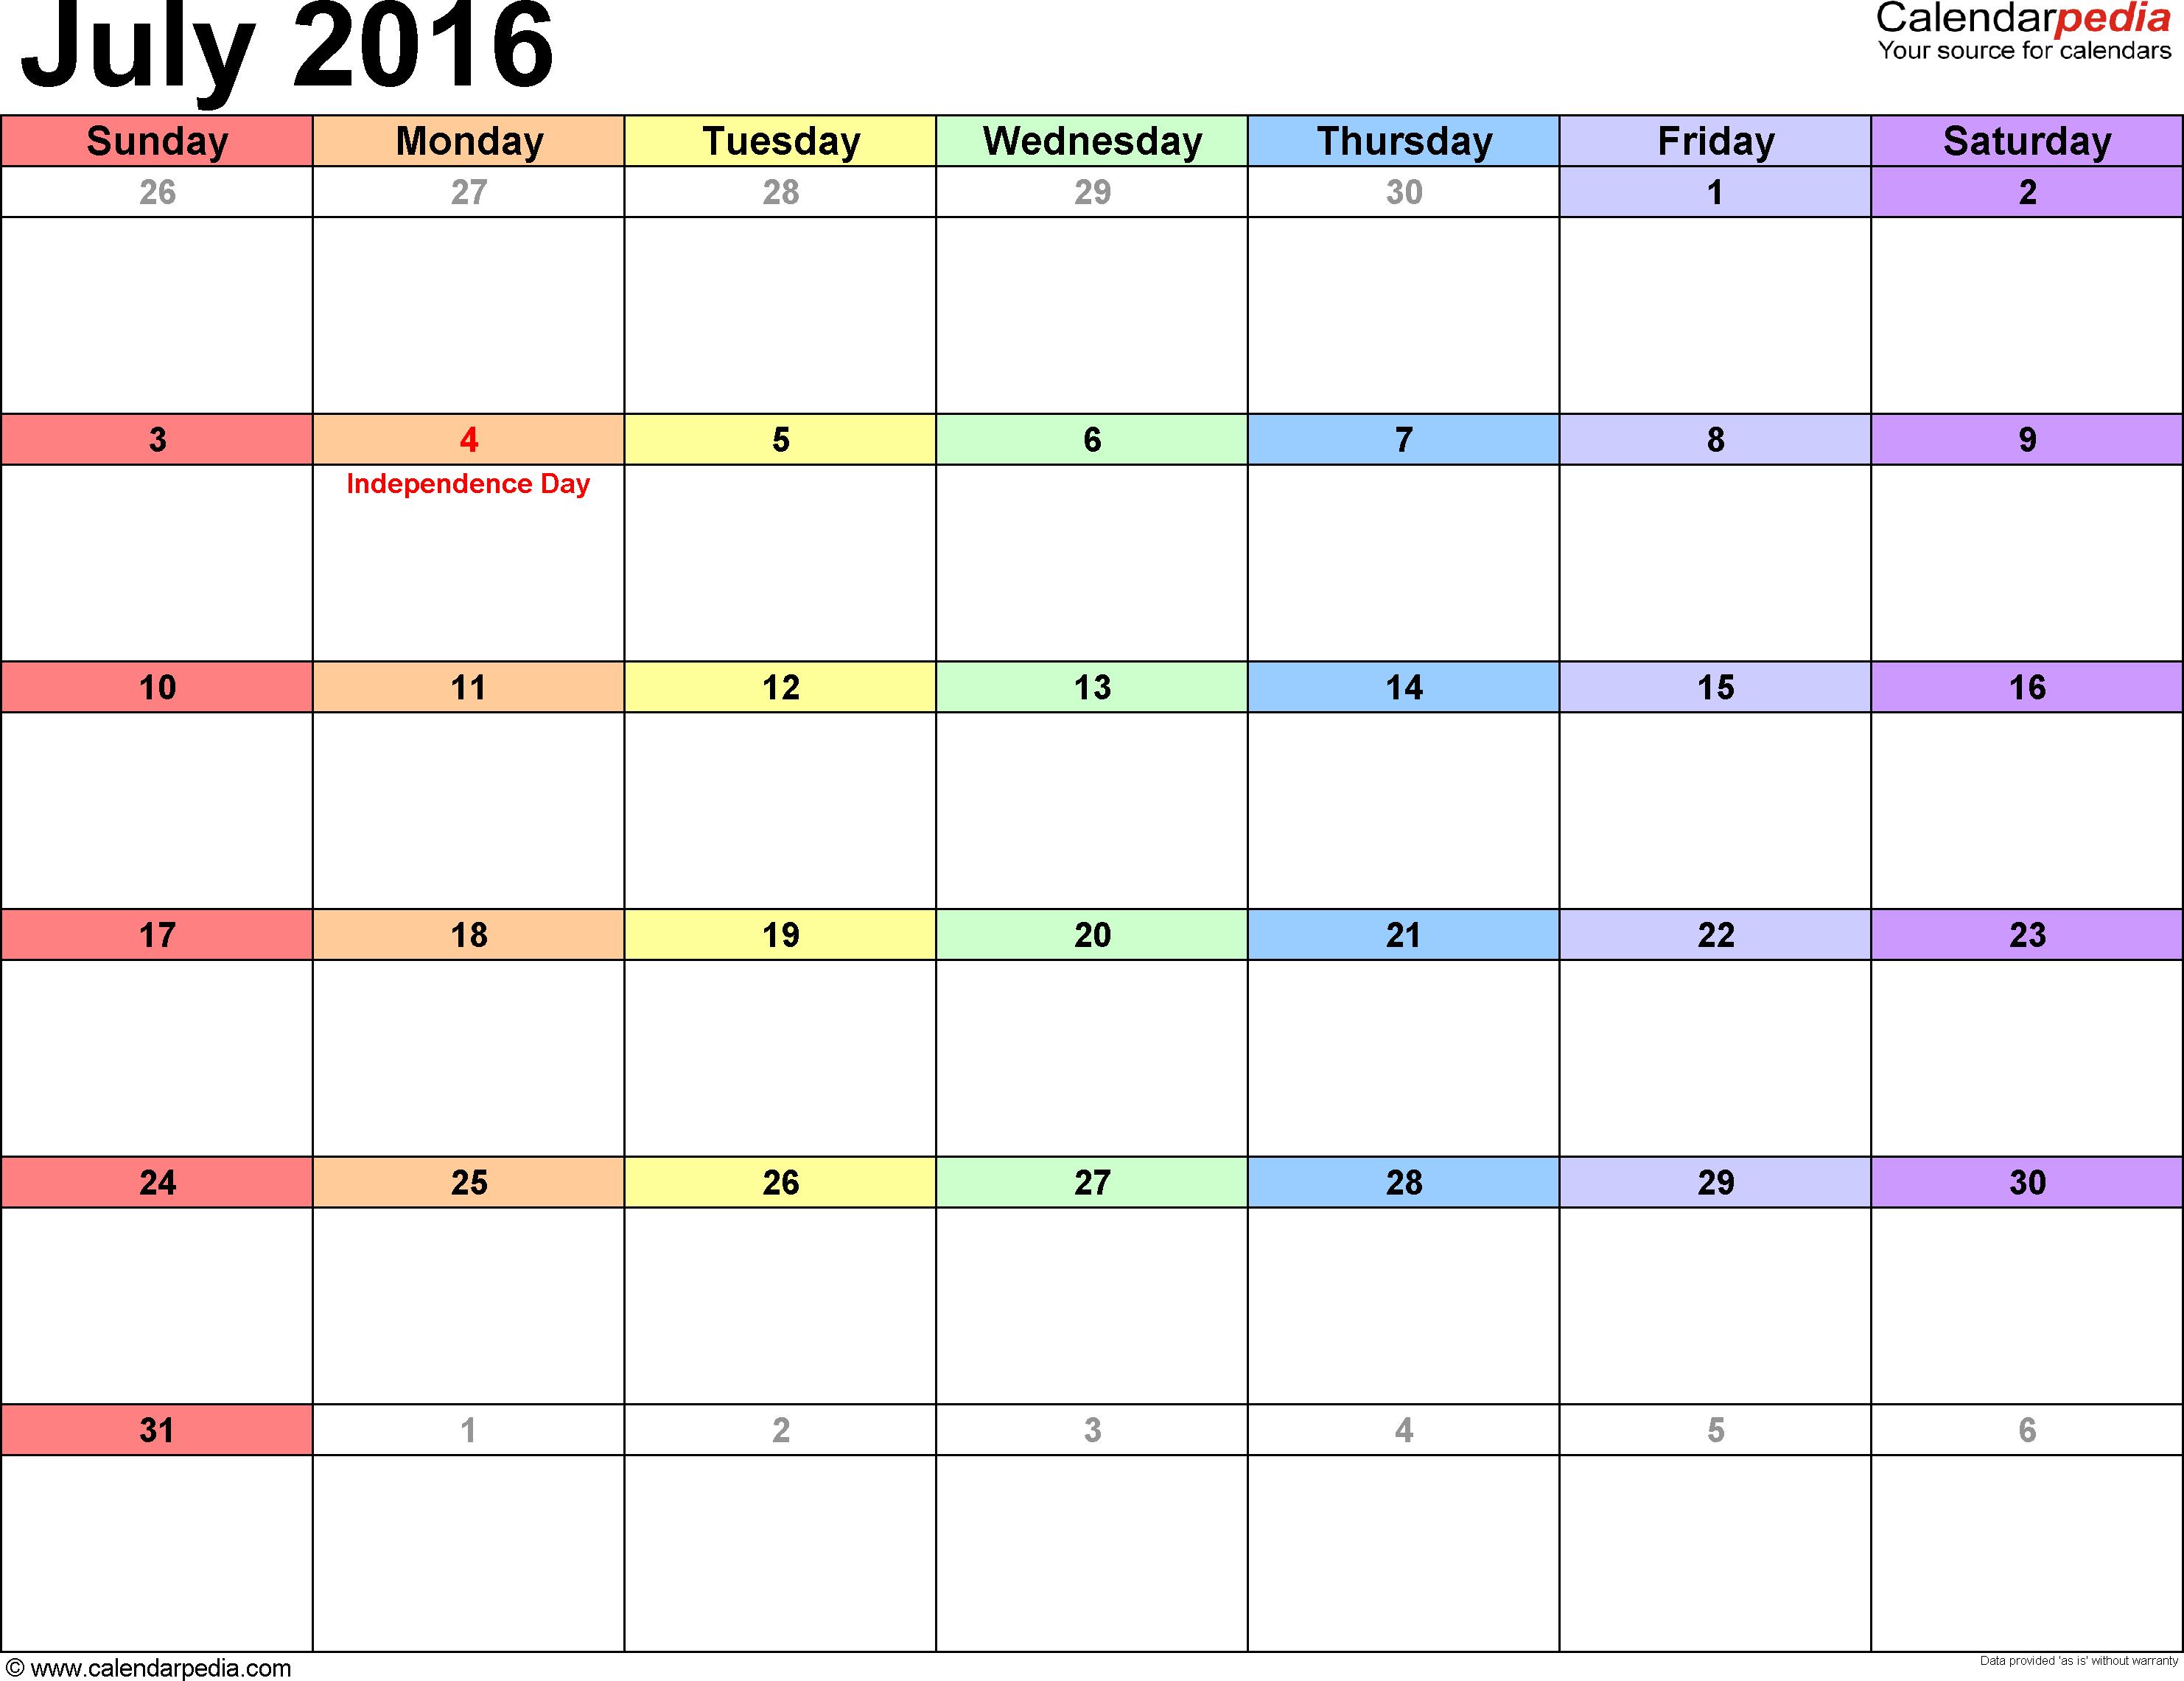 Calendar July 2016 UK, Bank Holidays, Excel/PDF/Word Templates